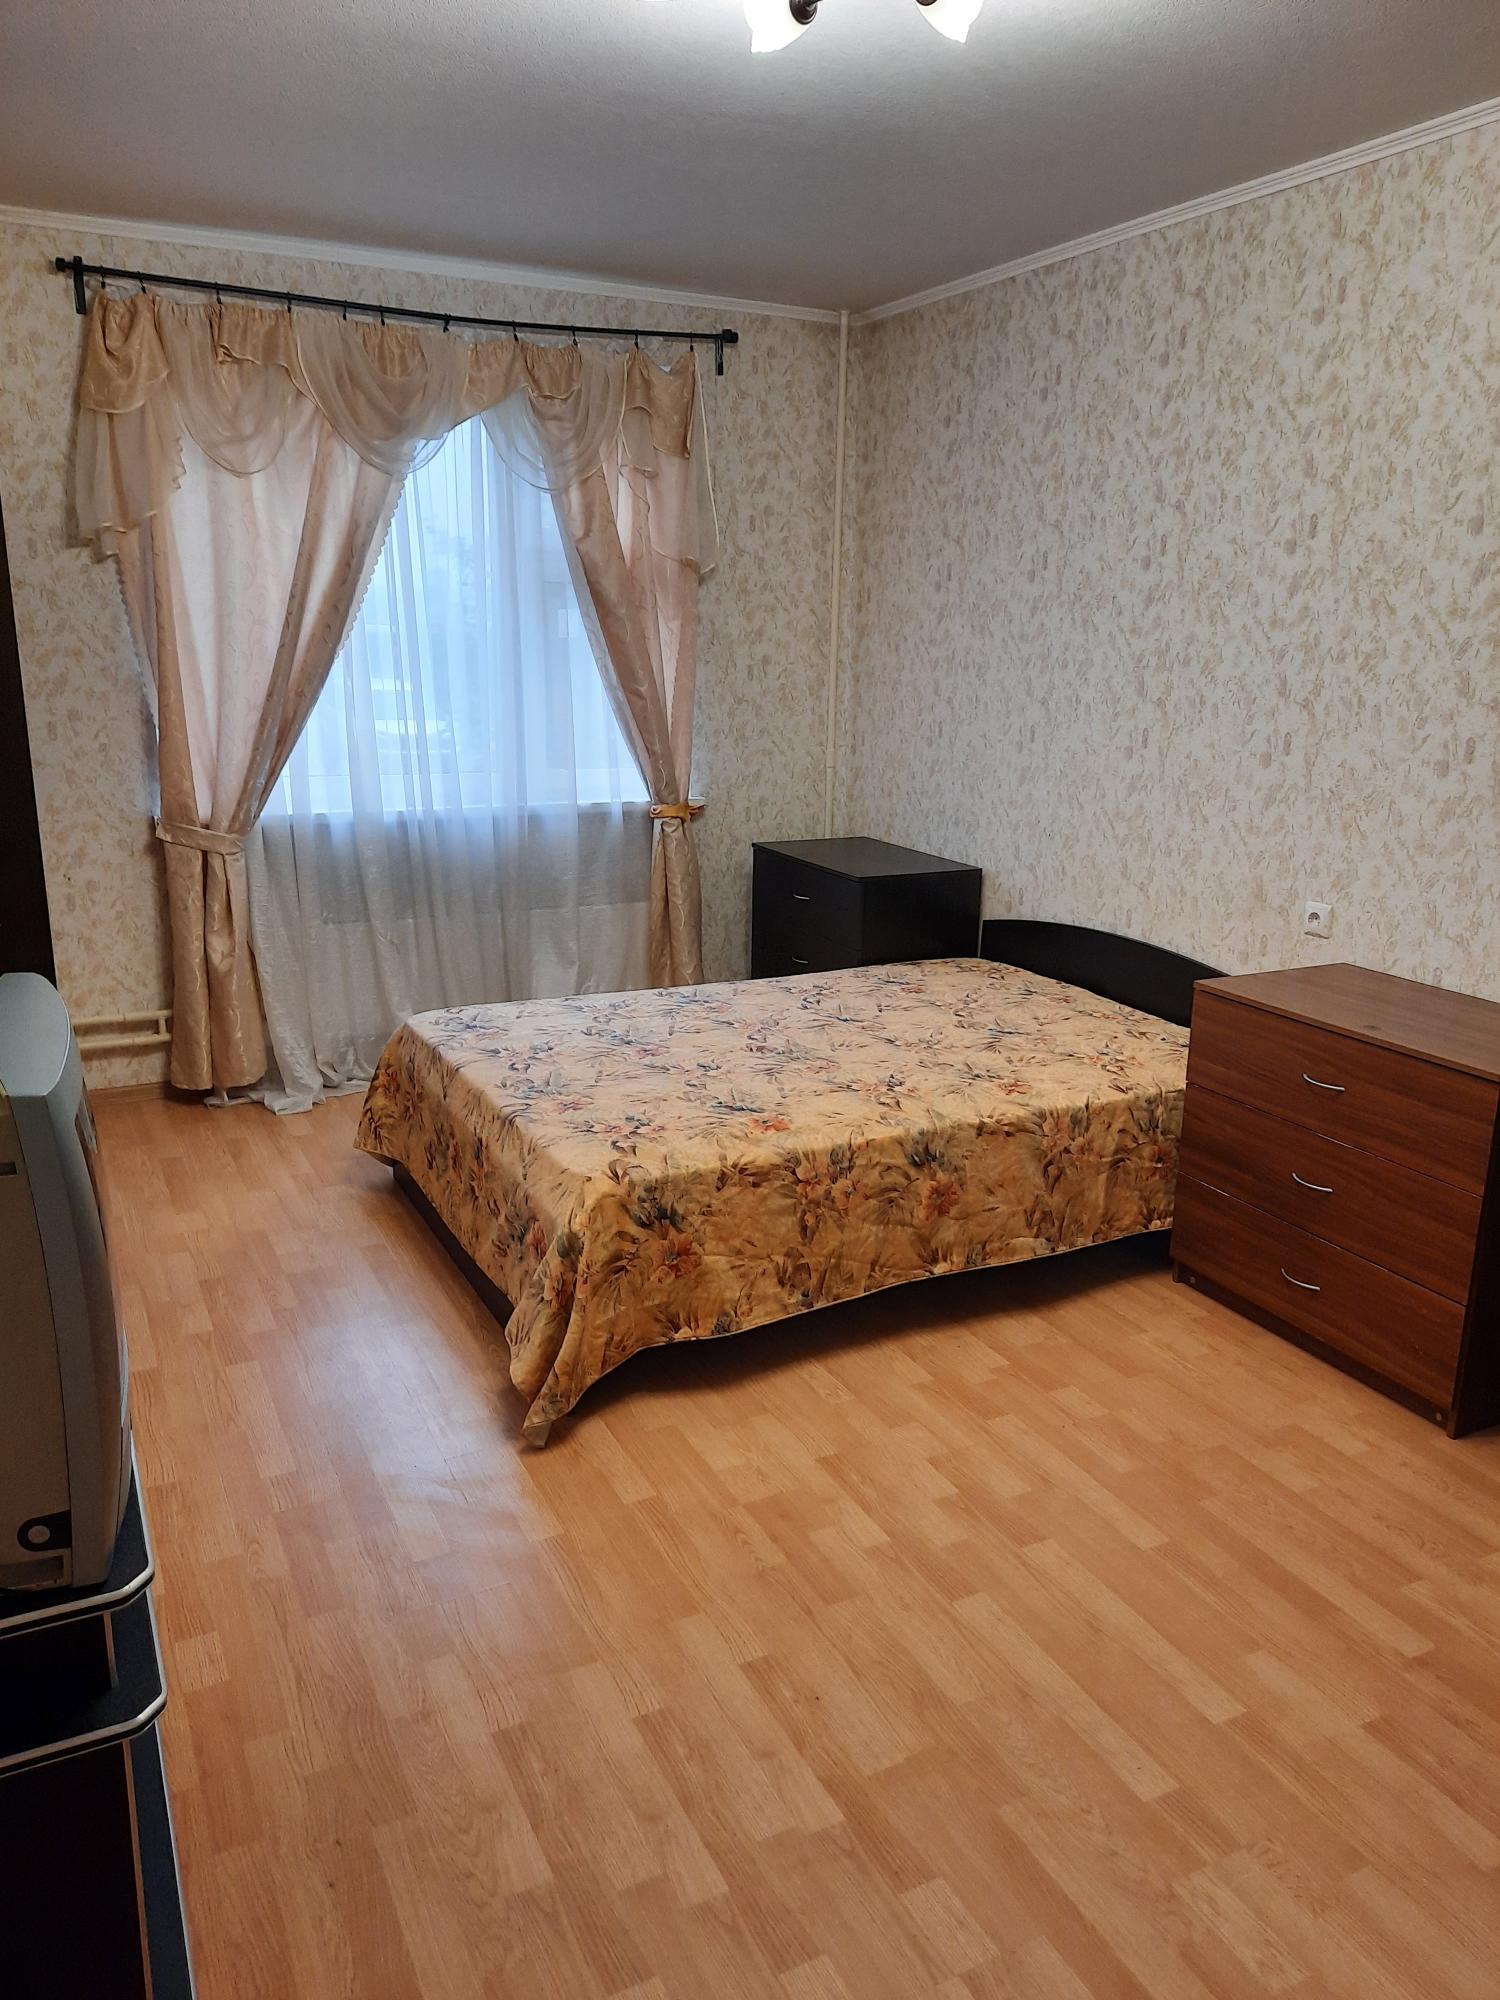 Квартира, 2 комнаты, 61 м² 89269689212 купить 6